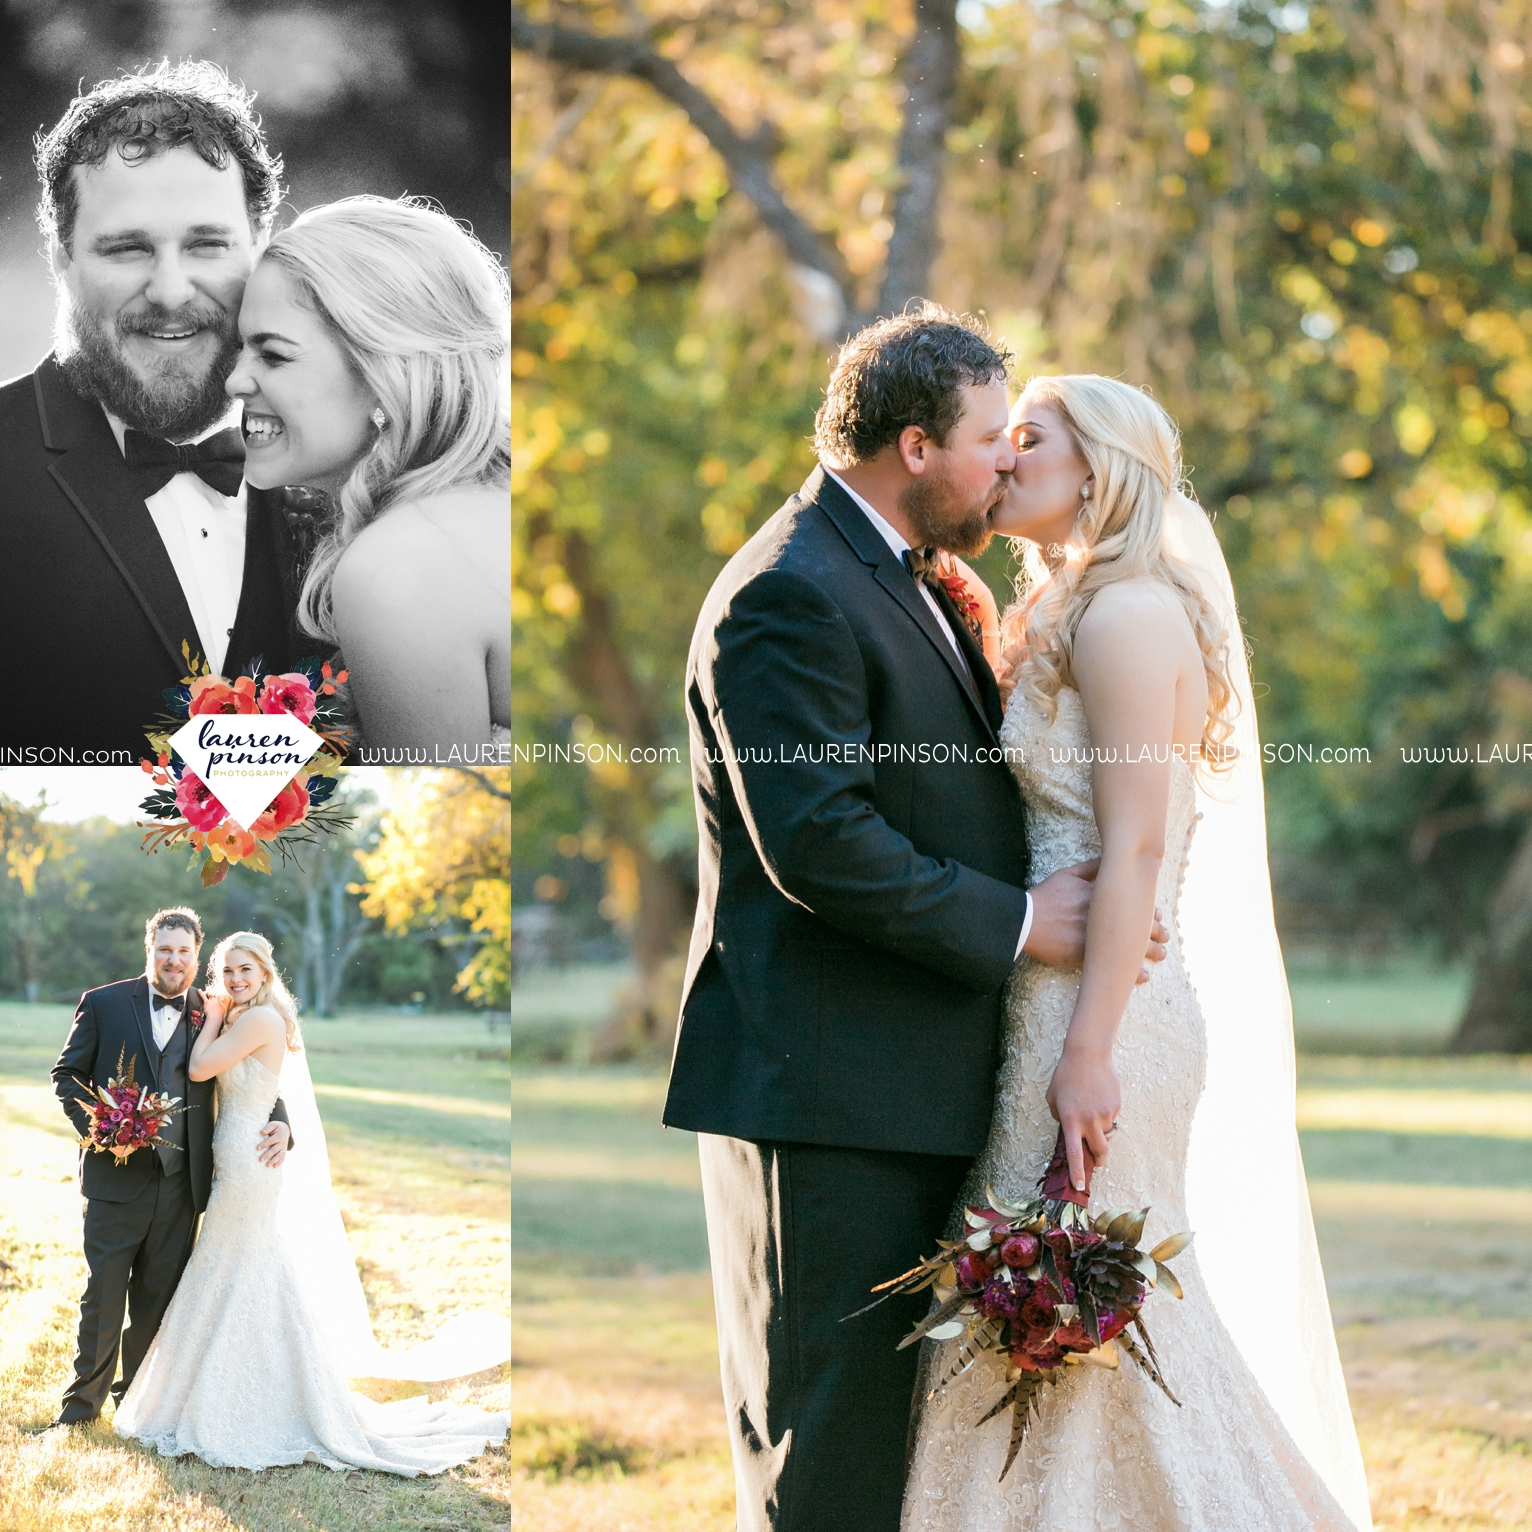 rustic-wichita-falls-texas-wedding-photographer-gold-glam-mayfield-events-market-street-united-allue-bridals-fall_1774.jpg